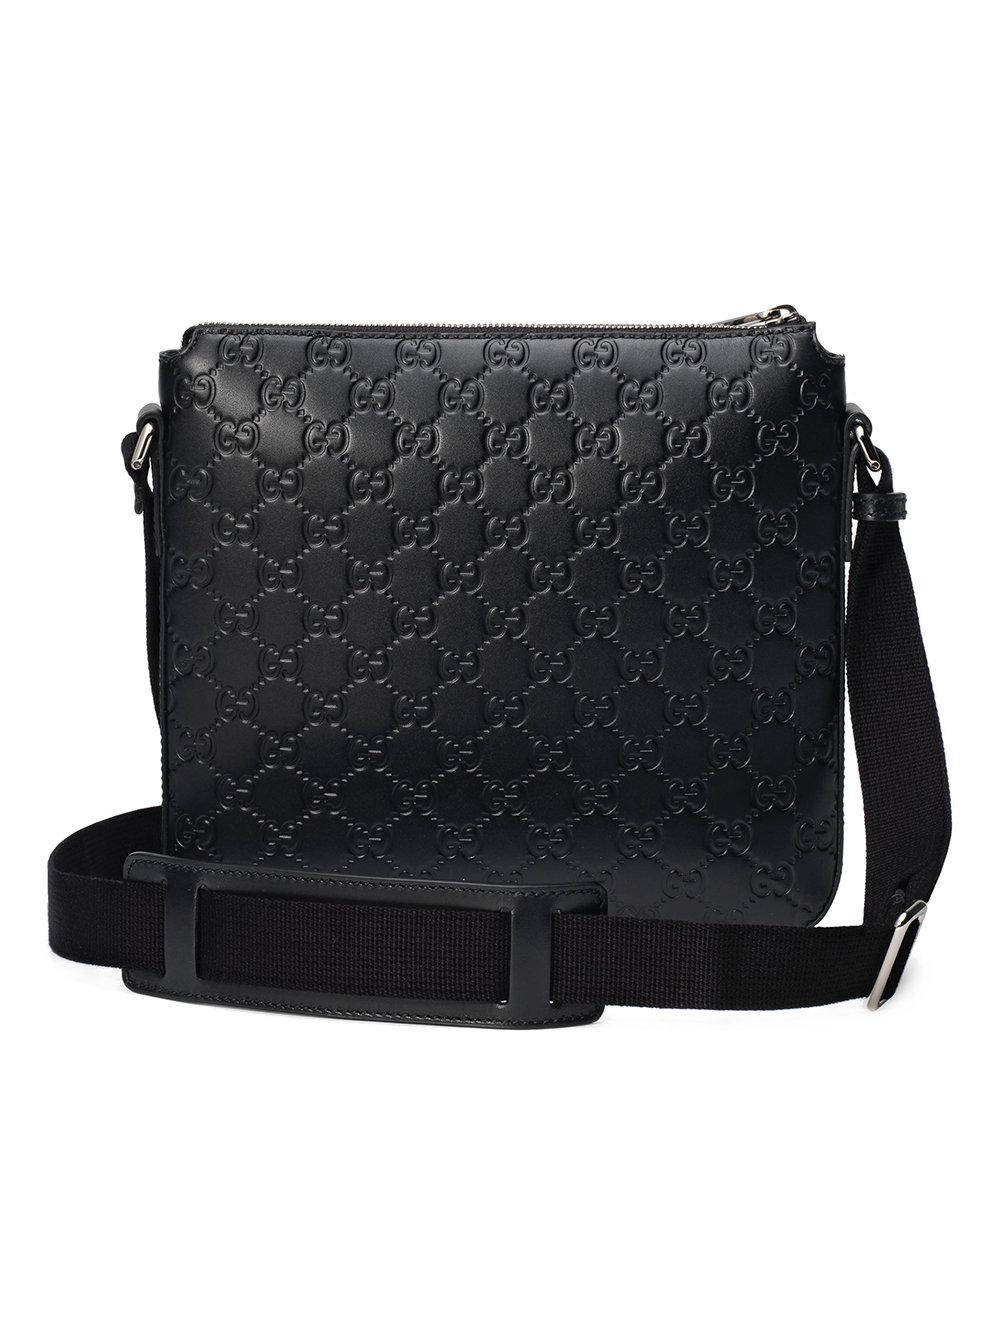 5fa09a47f Gucci Signature Messenger Bag in Black for Men - Save 15% - Lyst